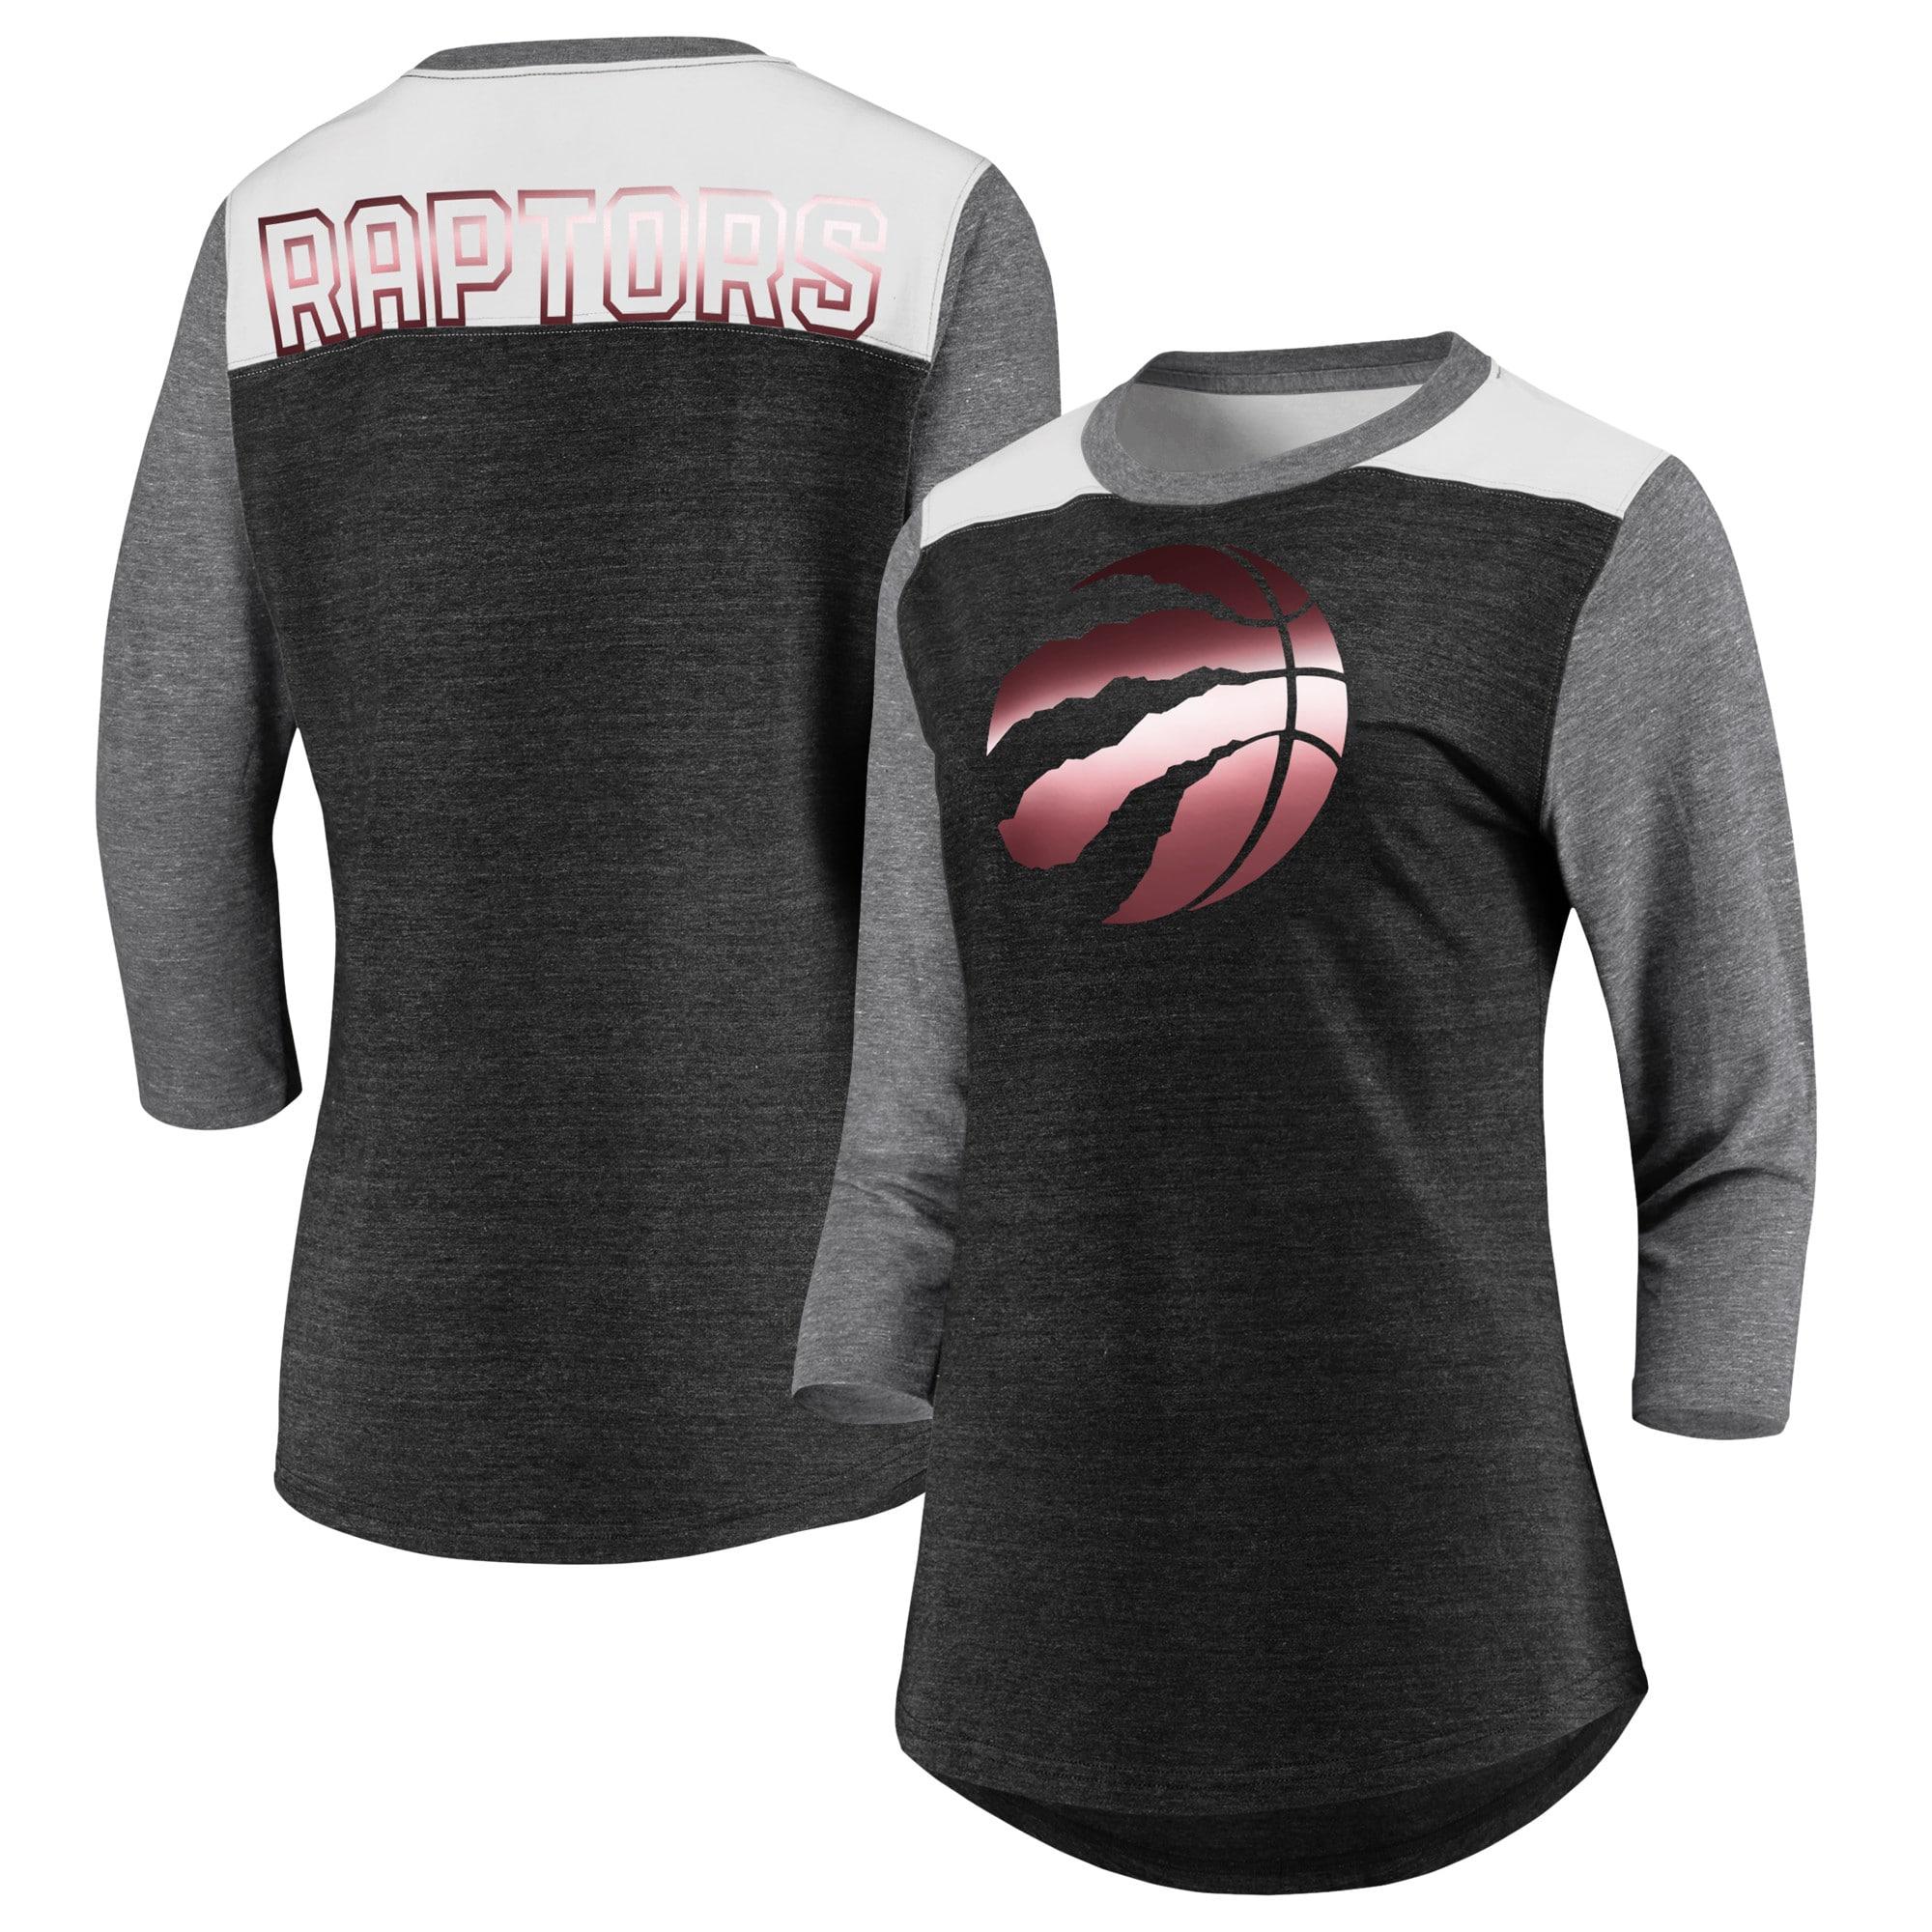 Toronto Raptors Fanatics Branded Women's Iconic 3/4-Sleeve Tri-Blend T-Shirt - Black/Heathered Gray